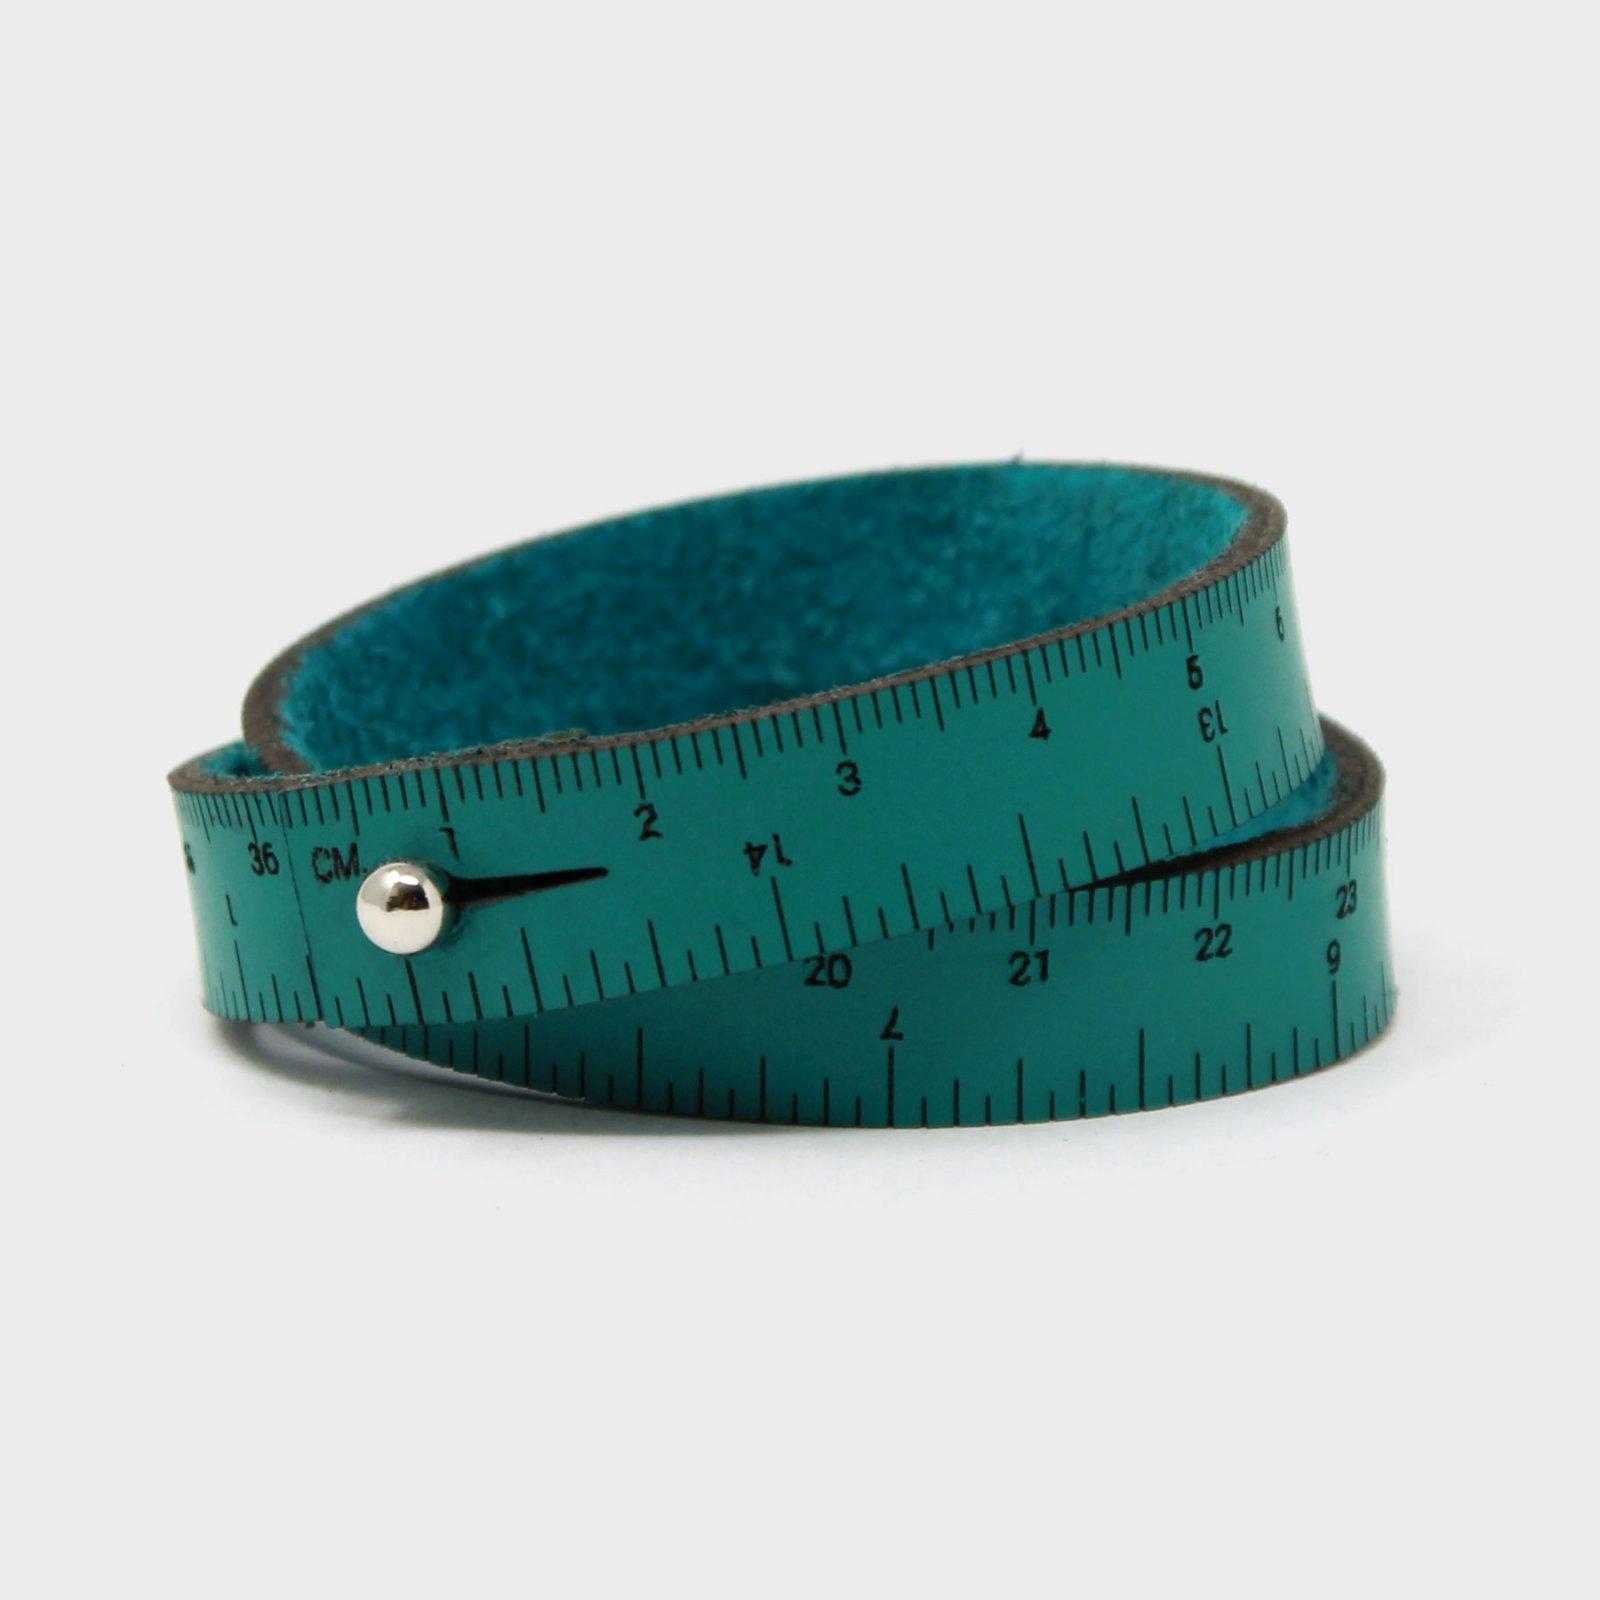 Wrist Ruler - Teal